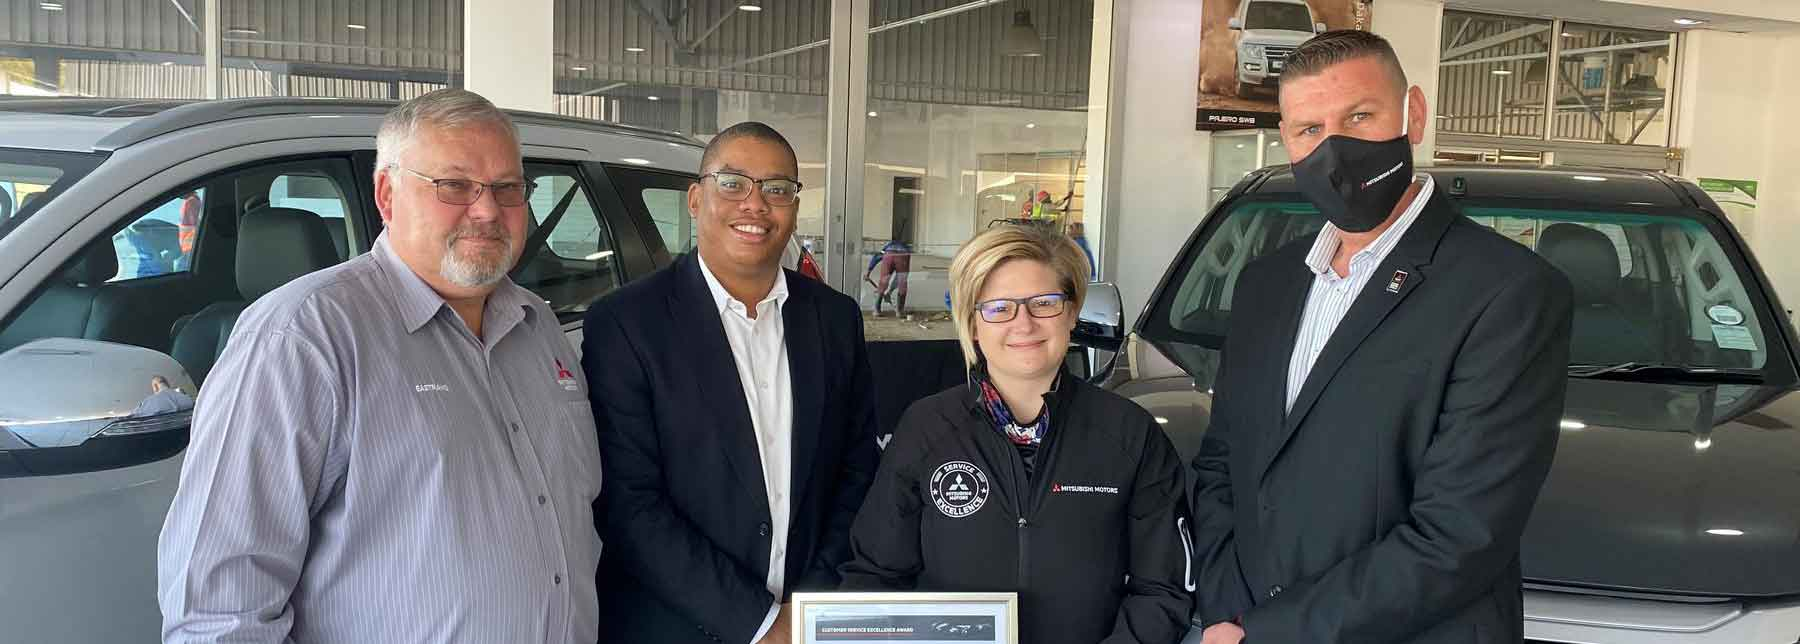 Mitsubishi South Africa receives performance award